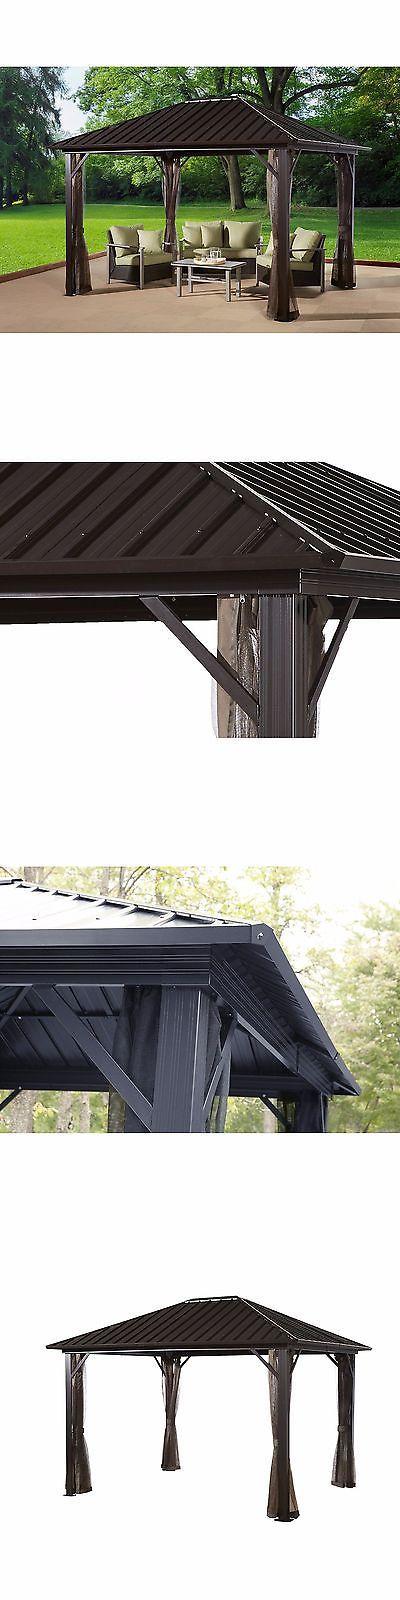 Gazebos 180995: Metal Roof Gazebo Hardtop 10X12 Permanent Outdoor Patio Aluminum Frame Backyard -> BUY IT NOW ONLY: $1966.95 on eBay!